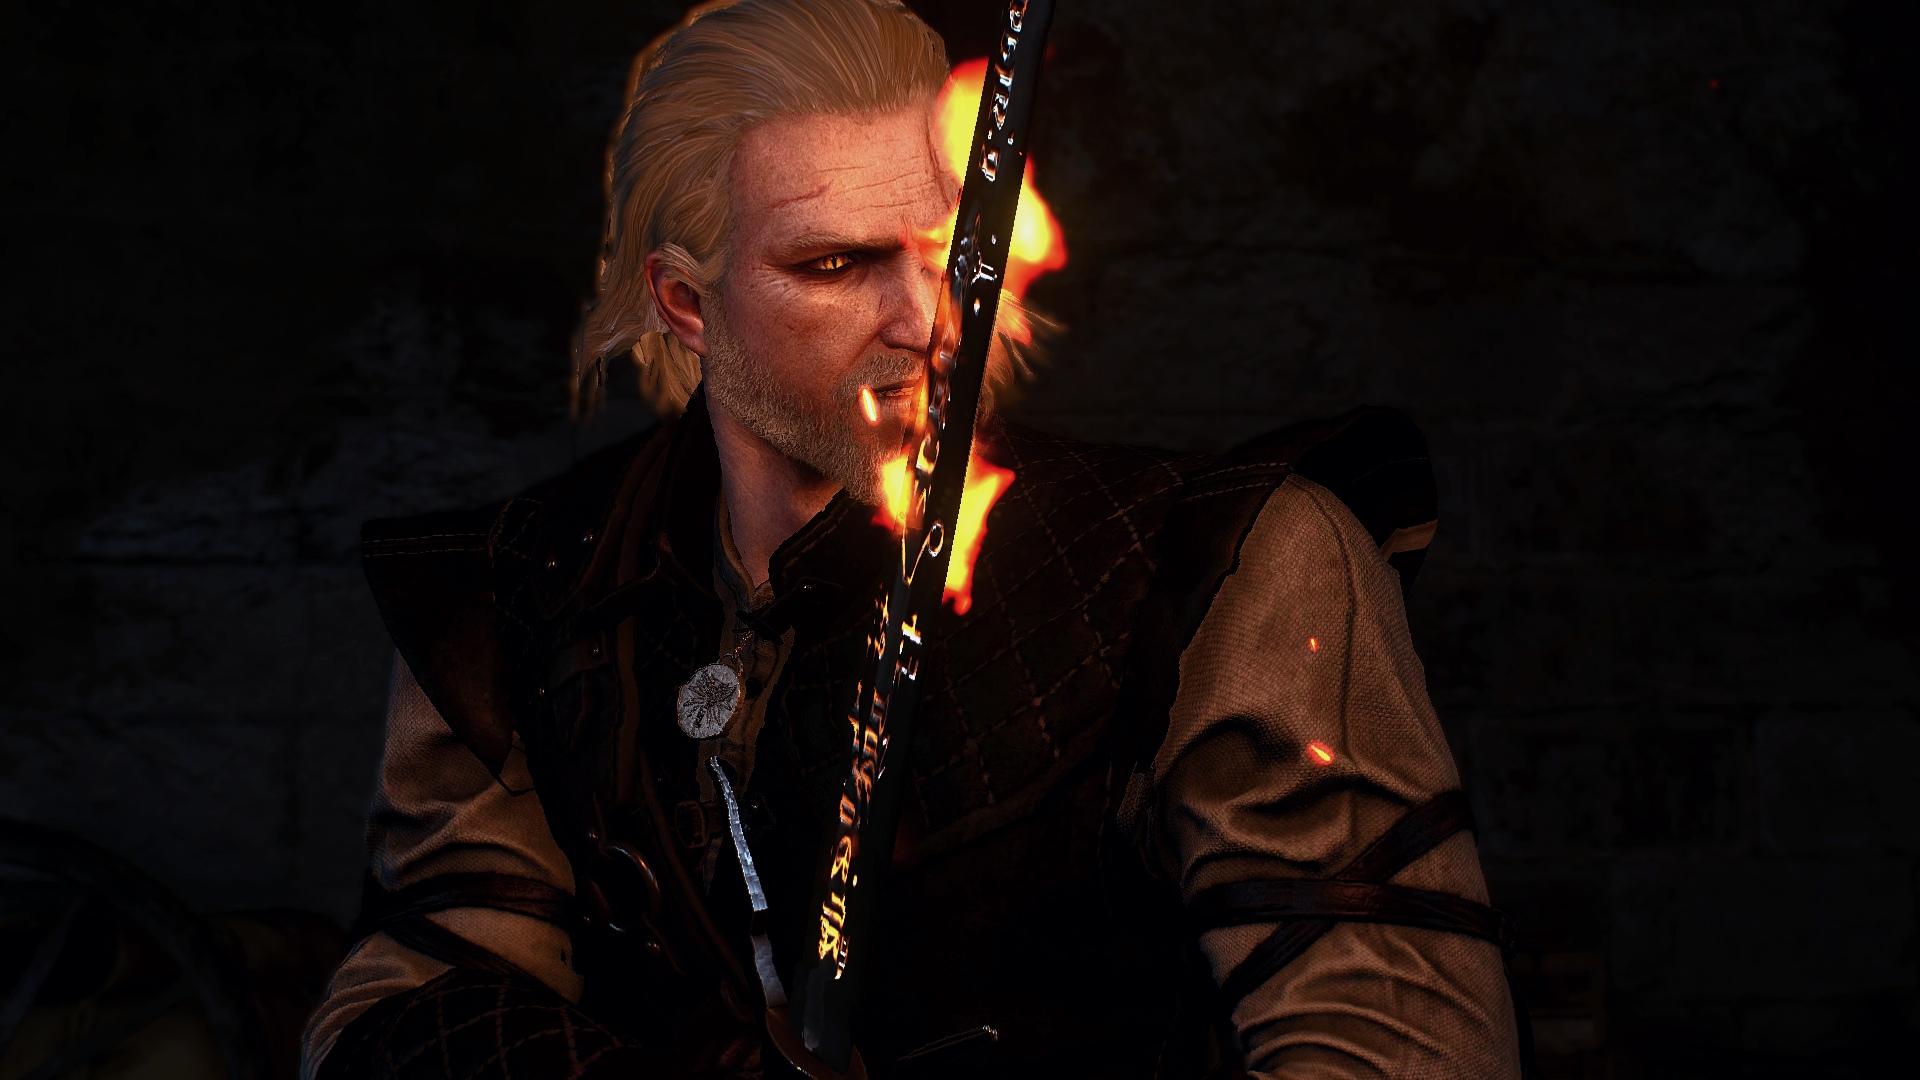 qk7eBjekckM.jpg - The Witcher 3: Wild Hunt